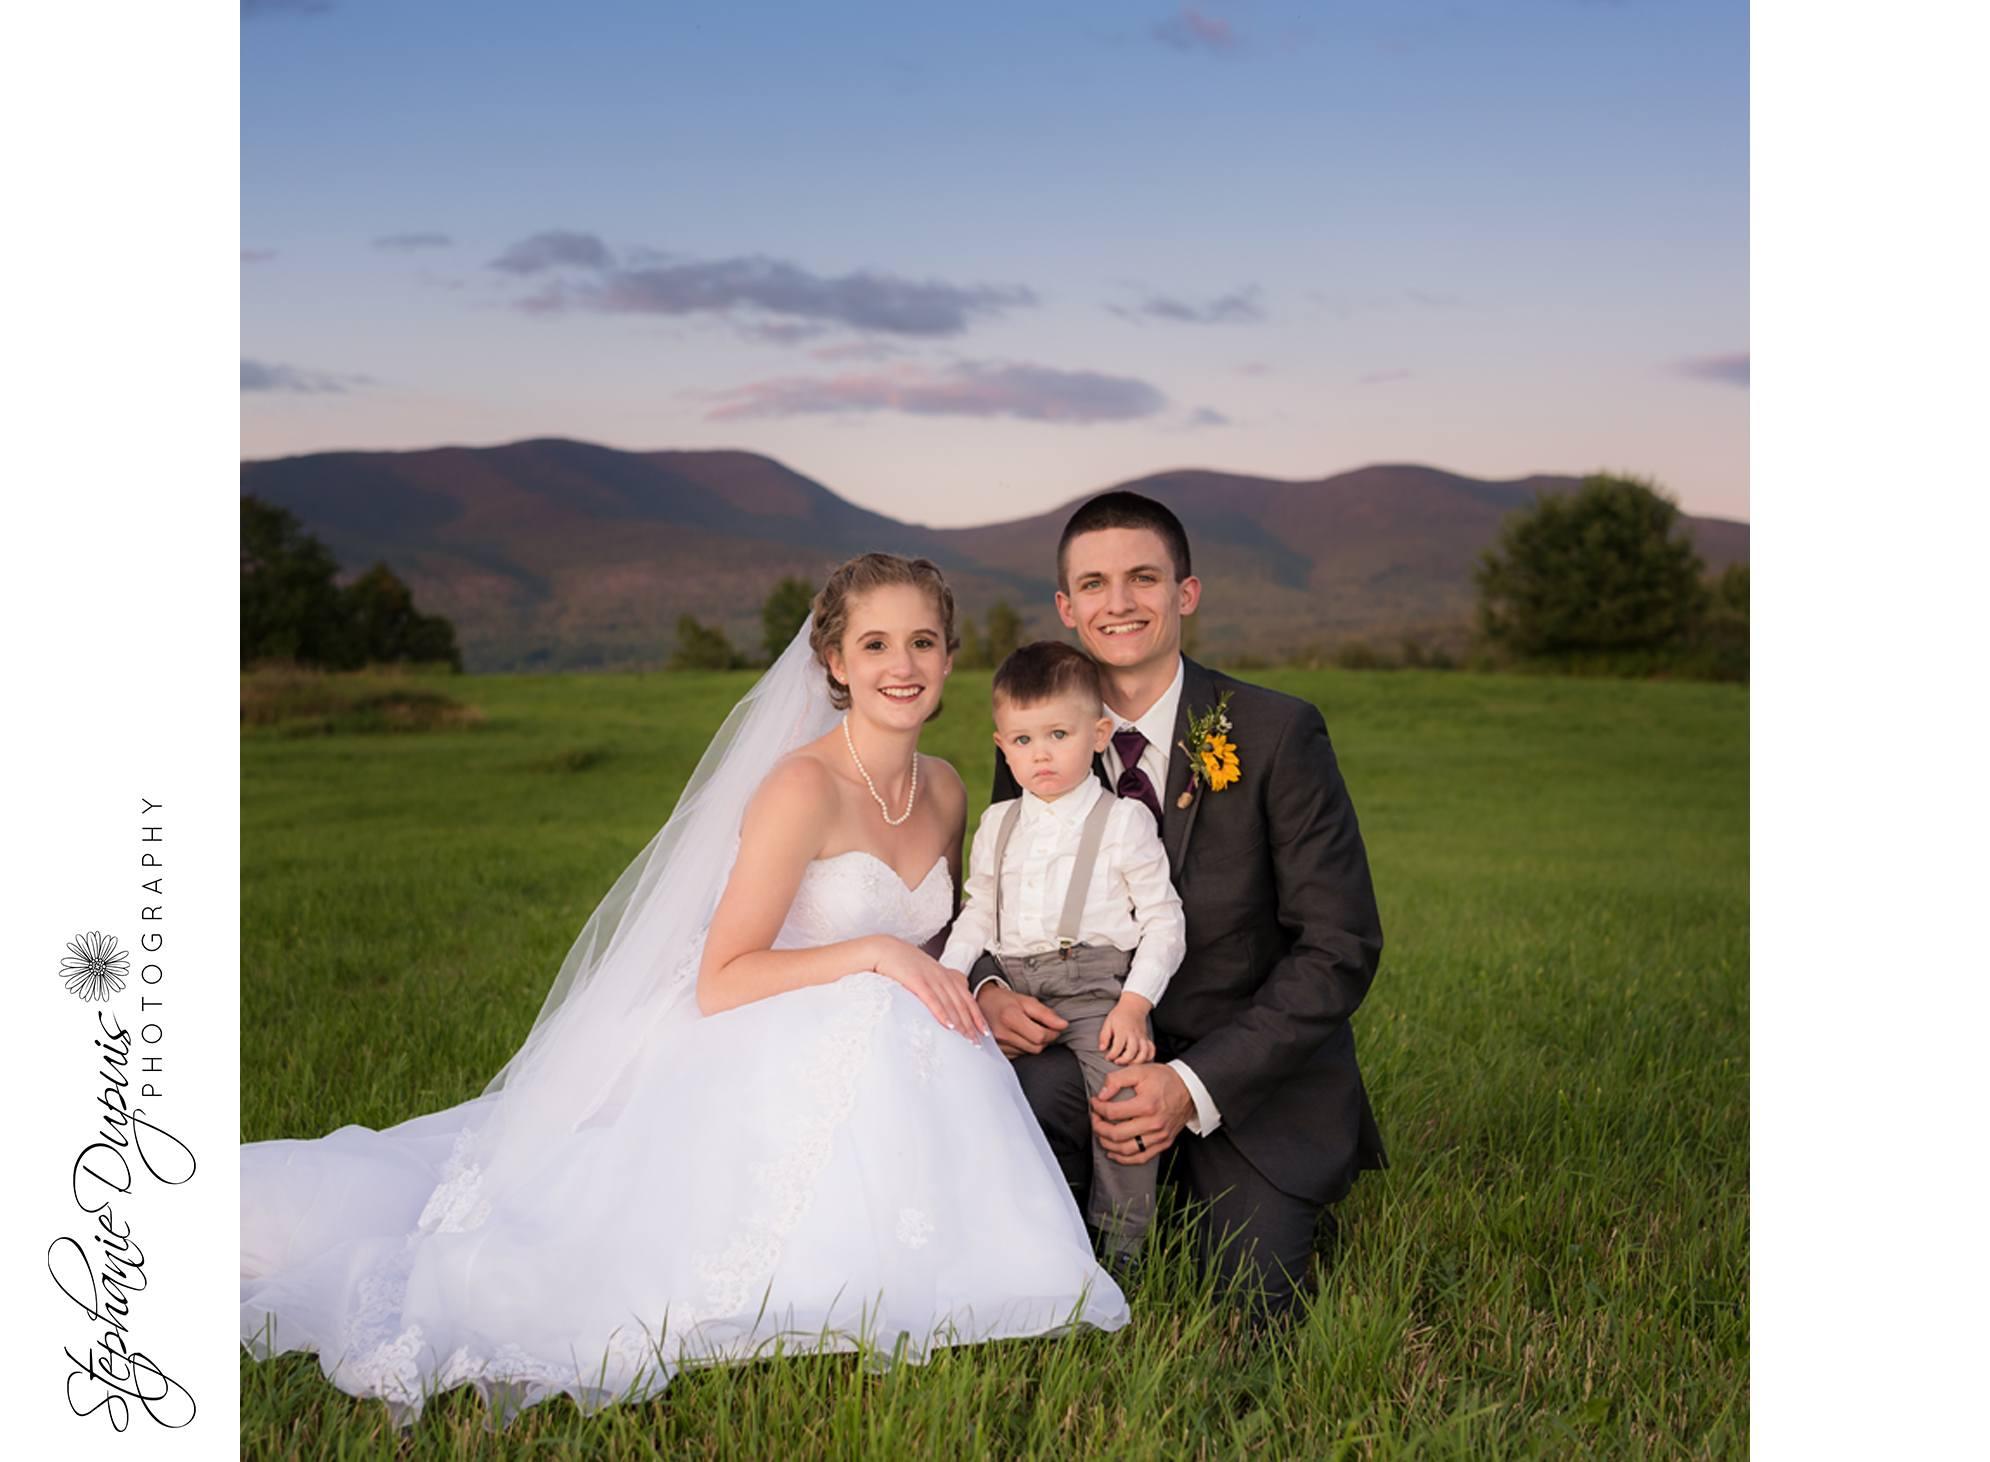 Whitefield Wedding Photographer 04 1 - Portfolio: Ward Wedding